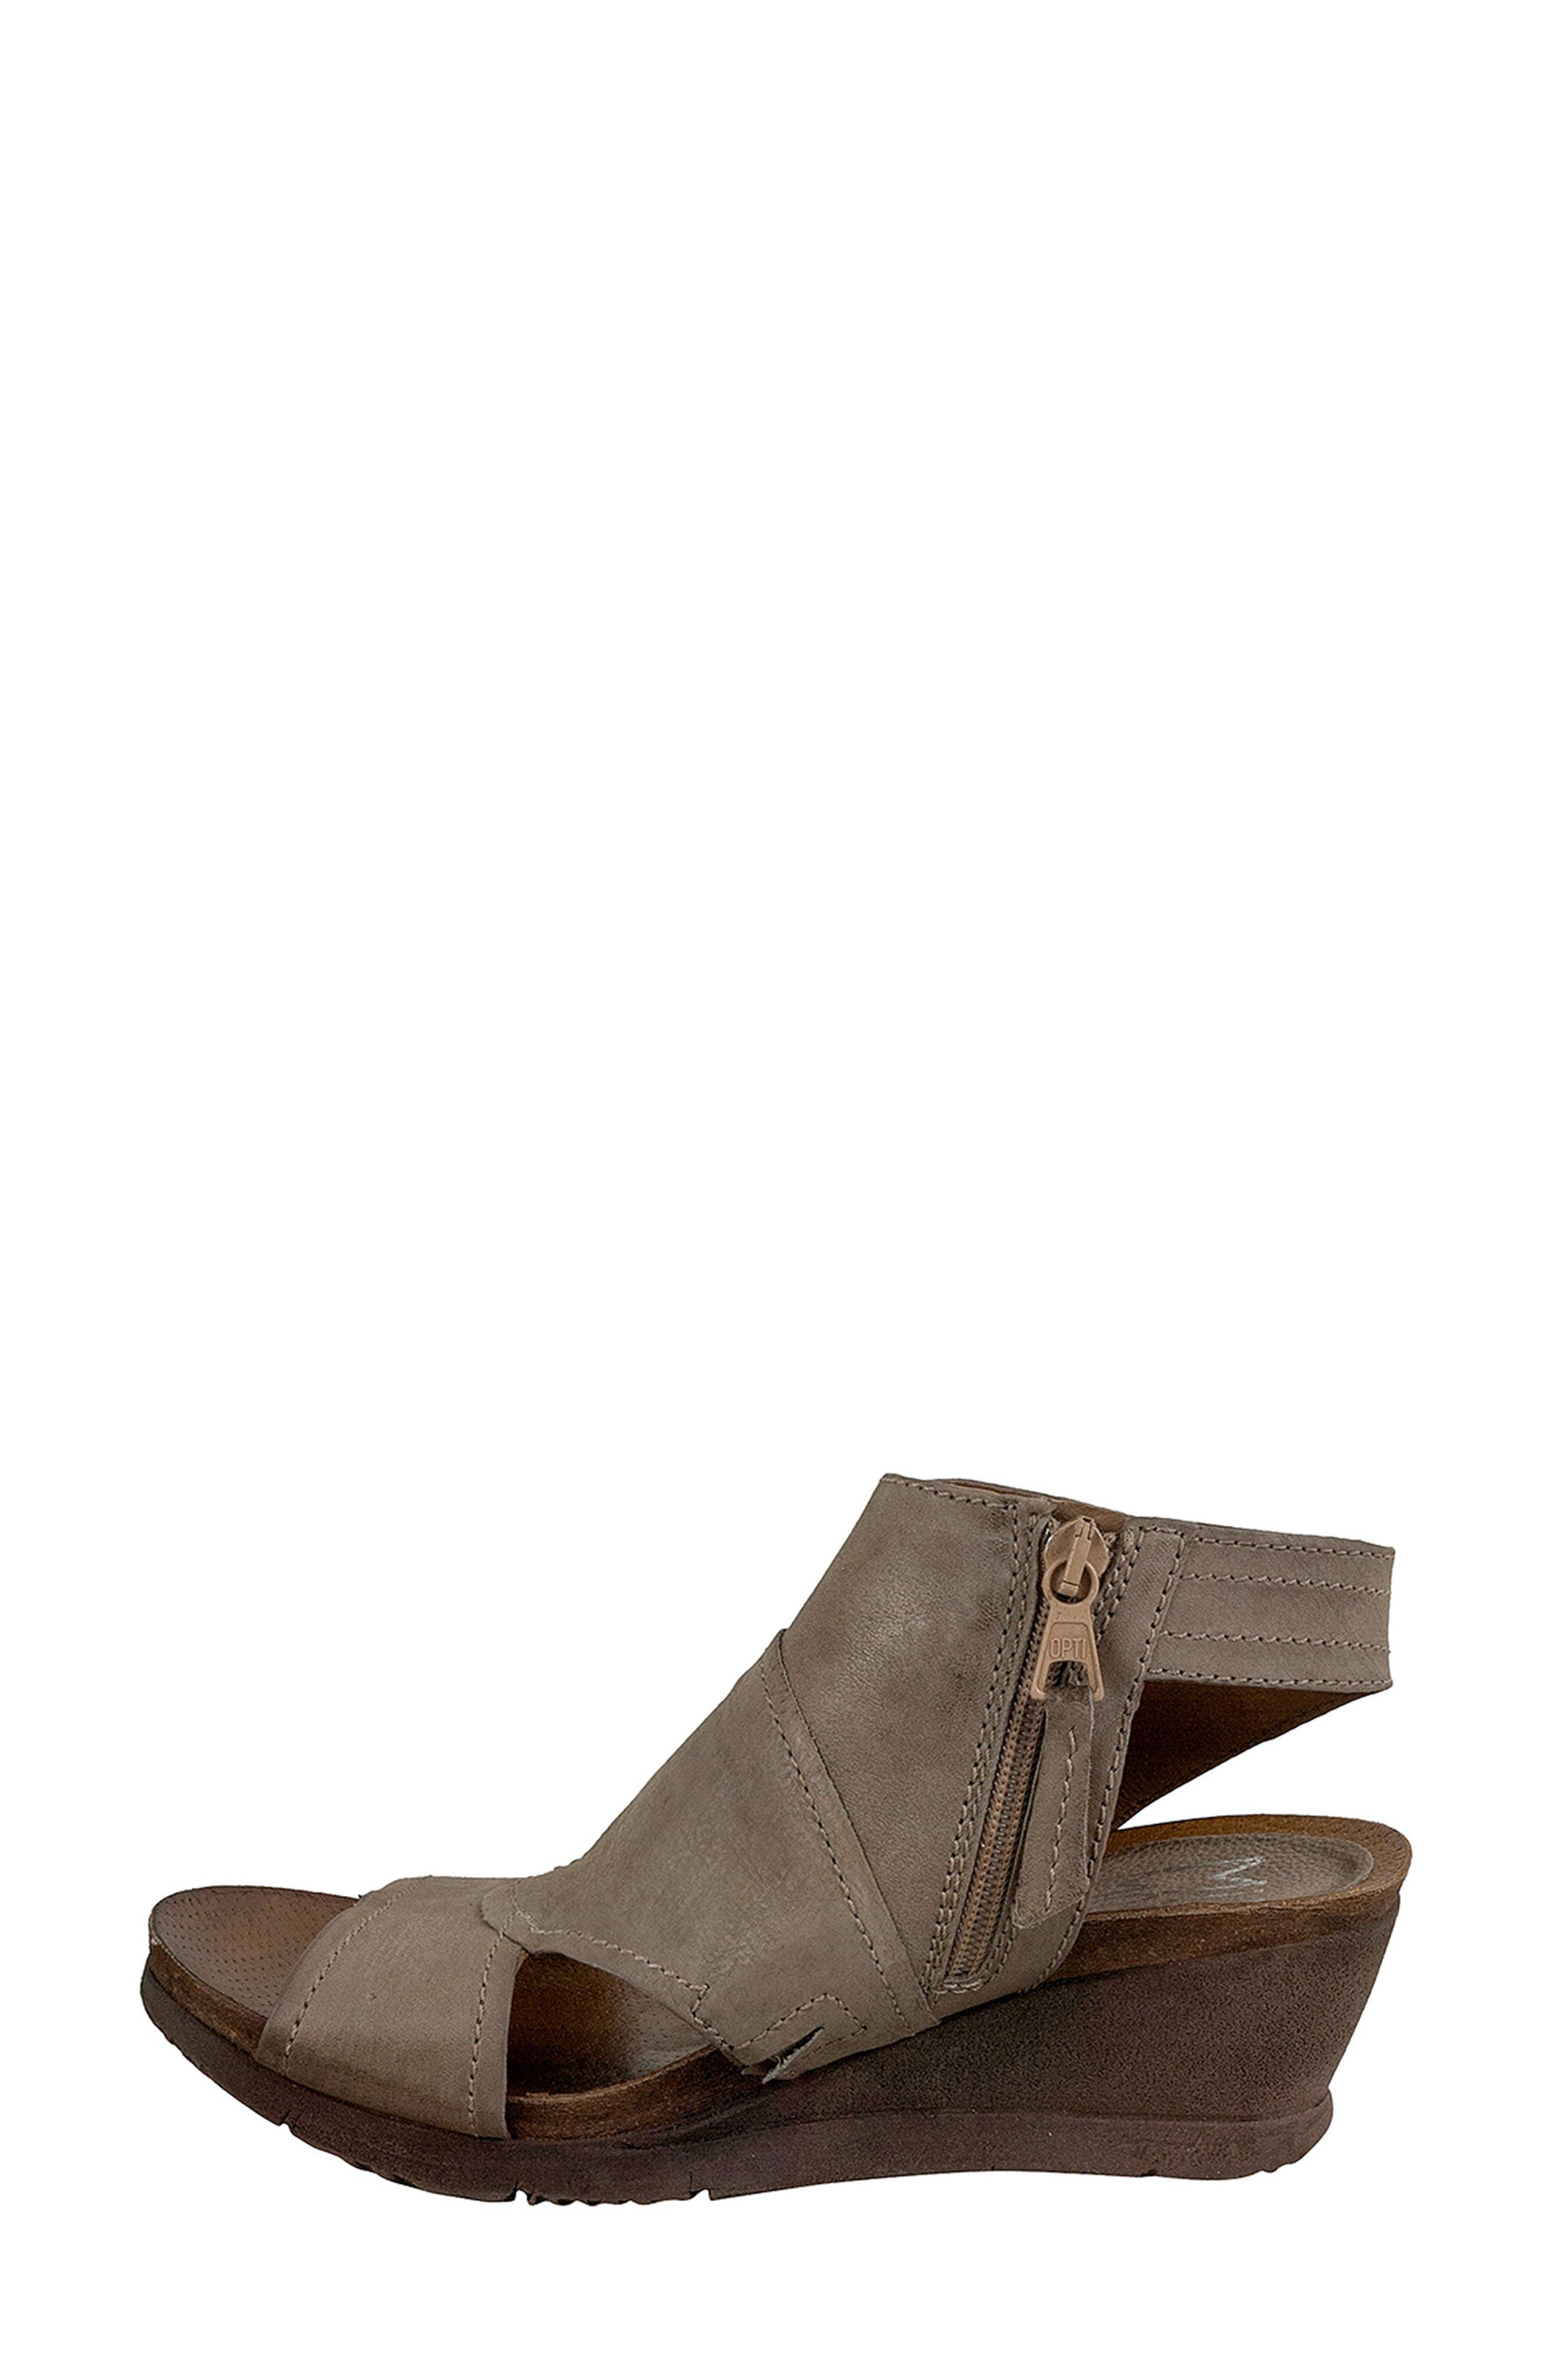 Scout Wedge Sandal,                             Alternate thumbnail 3, color,                             Pebble Leather